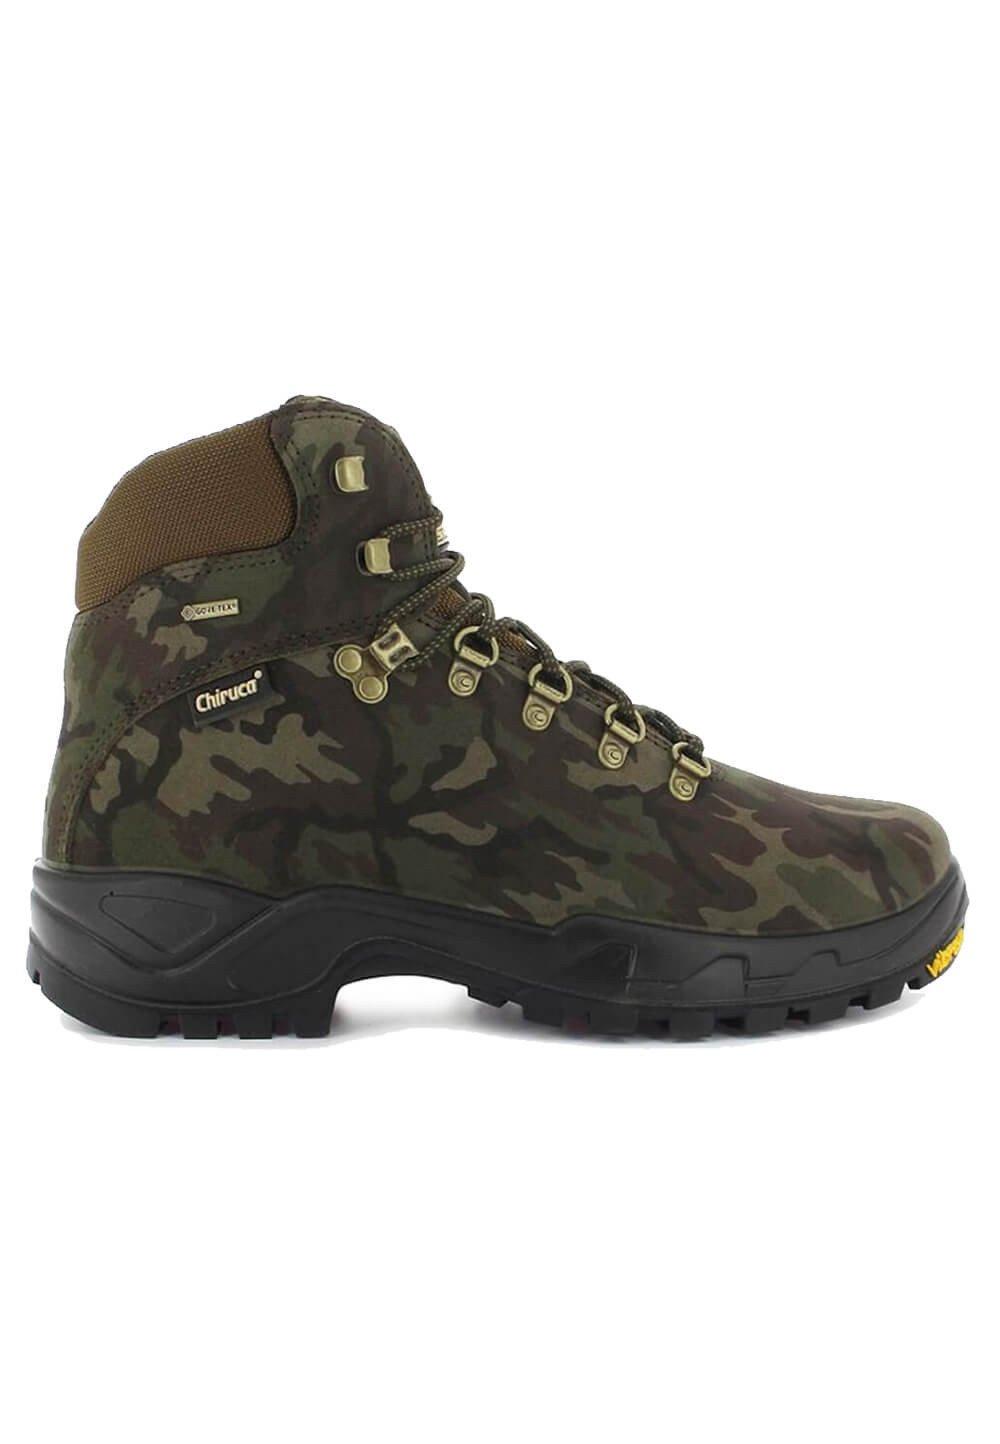 CHIRUCA CAMO 21 47 EU|Verdoso Venta de calzado deportivo de moda en línea